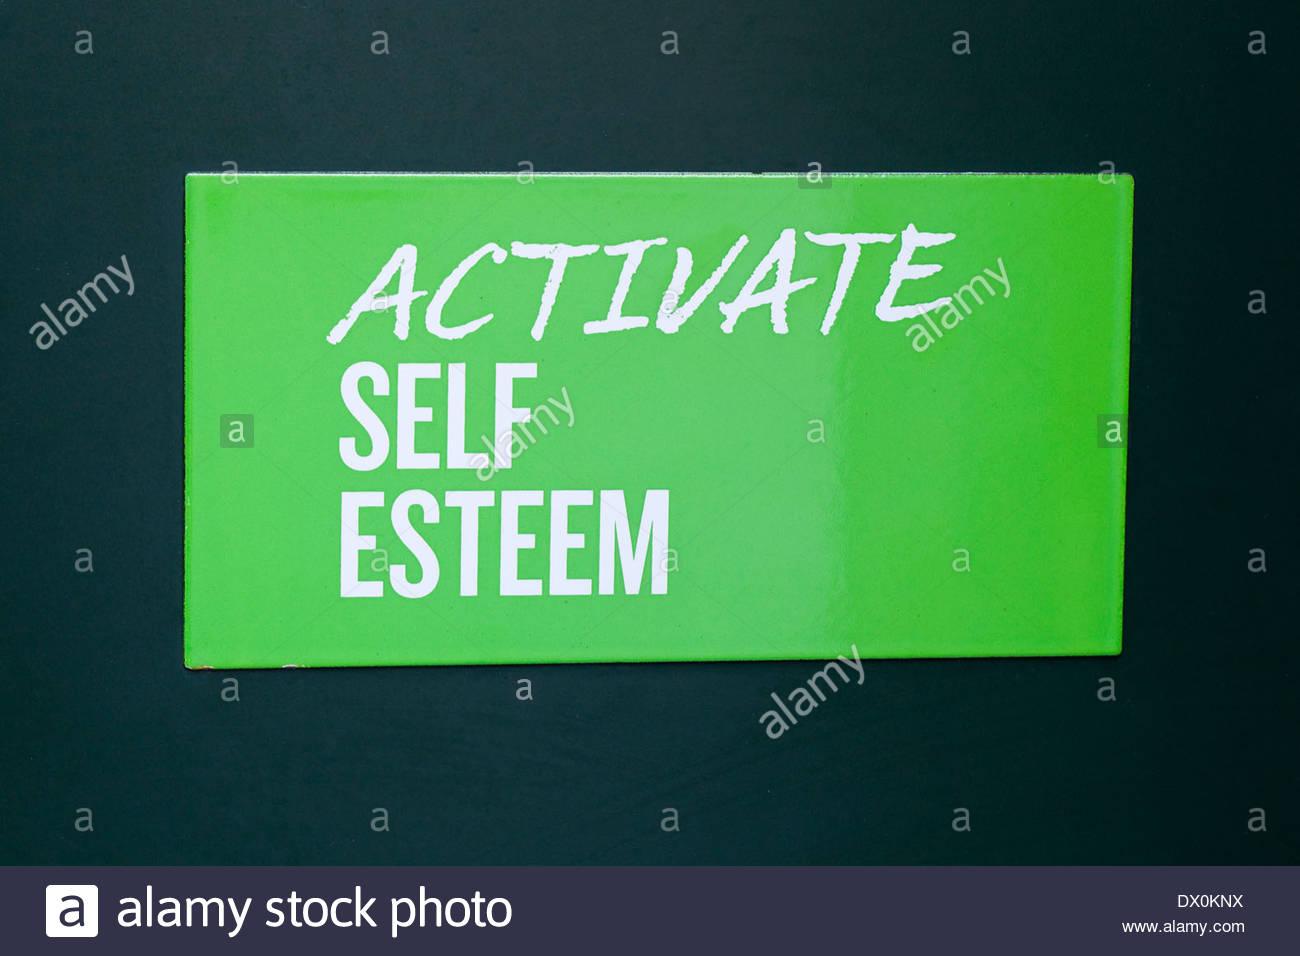 Plaque Promoting self Esteem in London - Stock Image